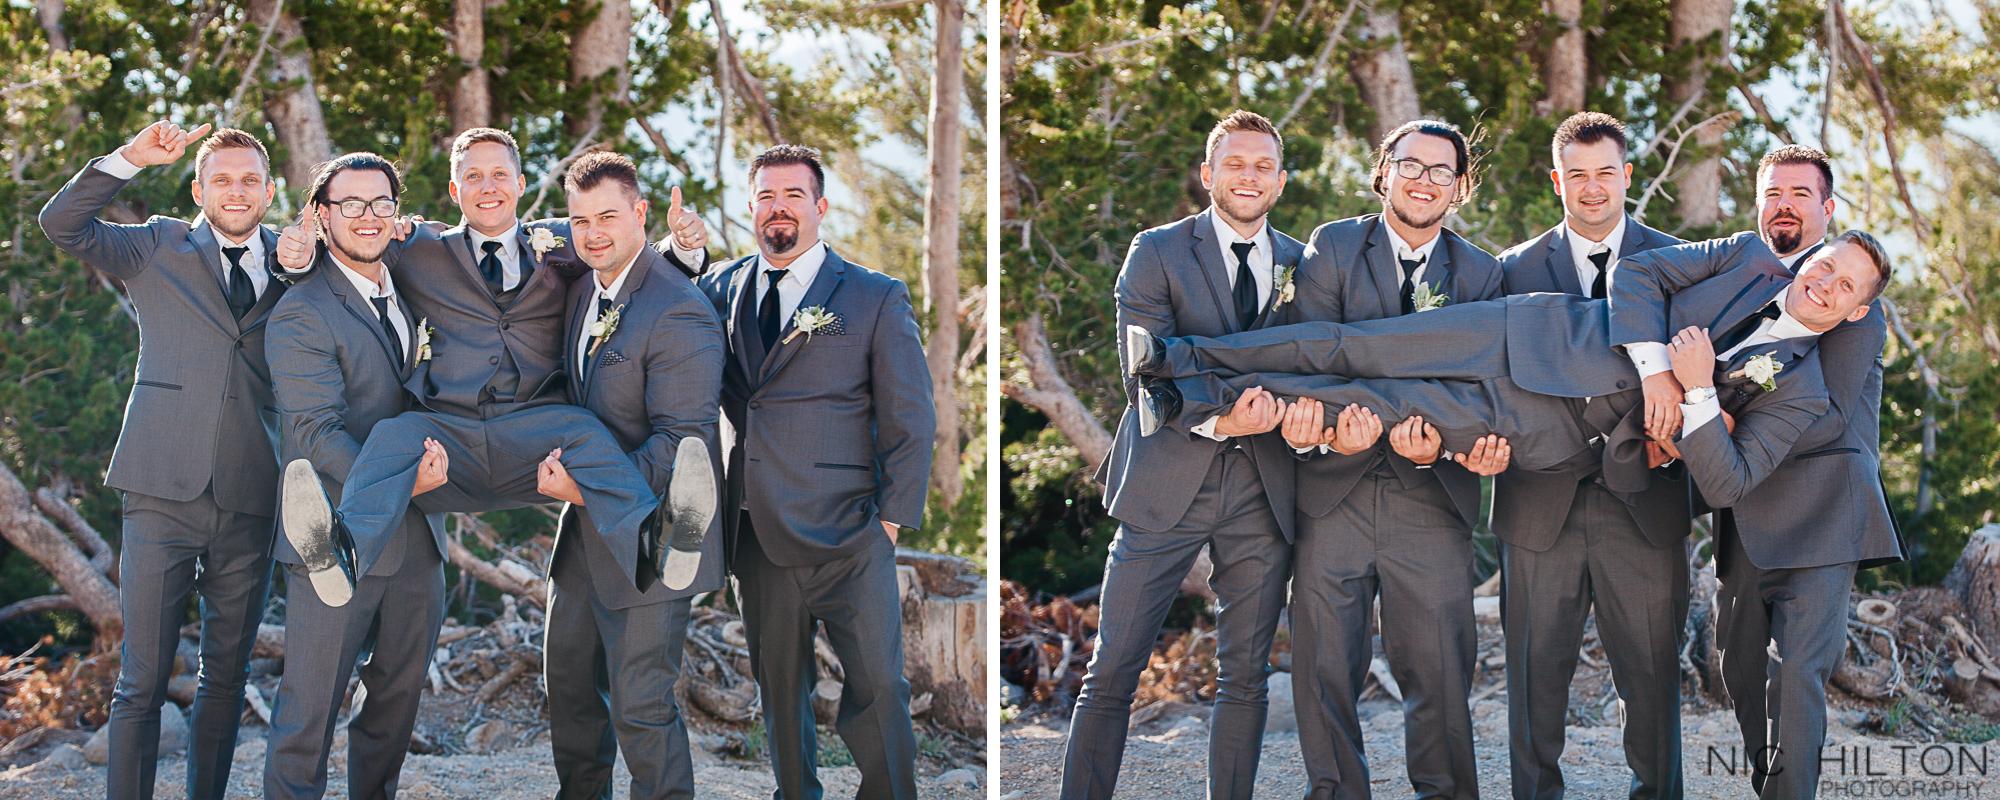 Groomsmen-Mammoth-Wedding-Photography.jpg